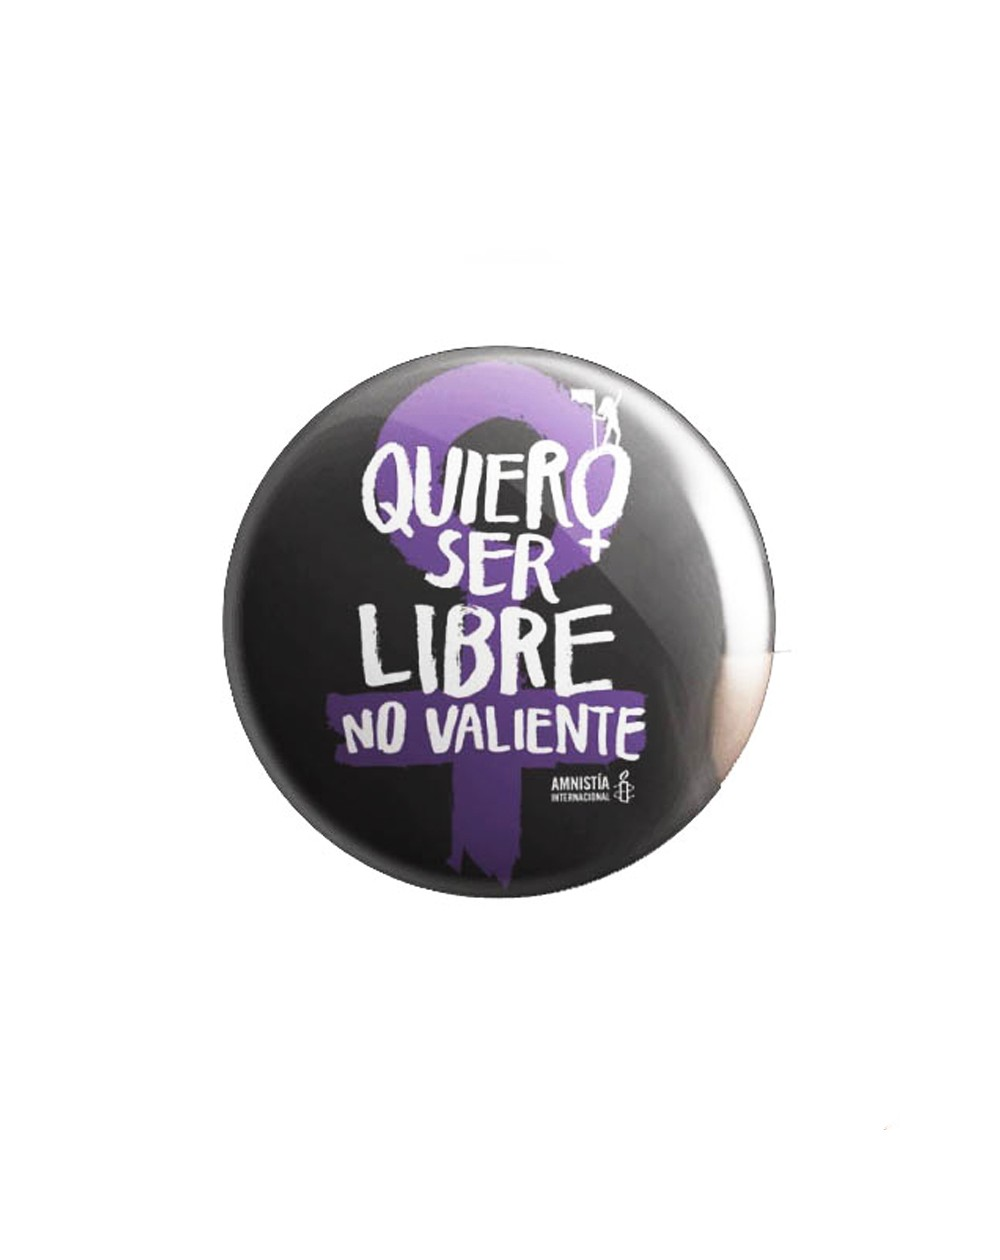 Chapa feminista Amnistía Internacional. Chapa feminista negra